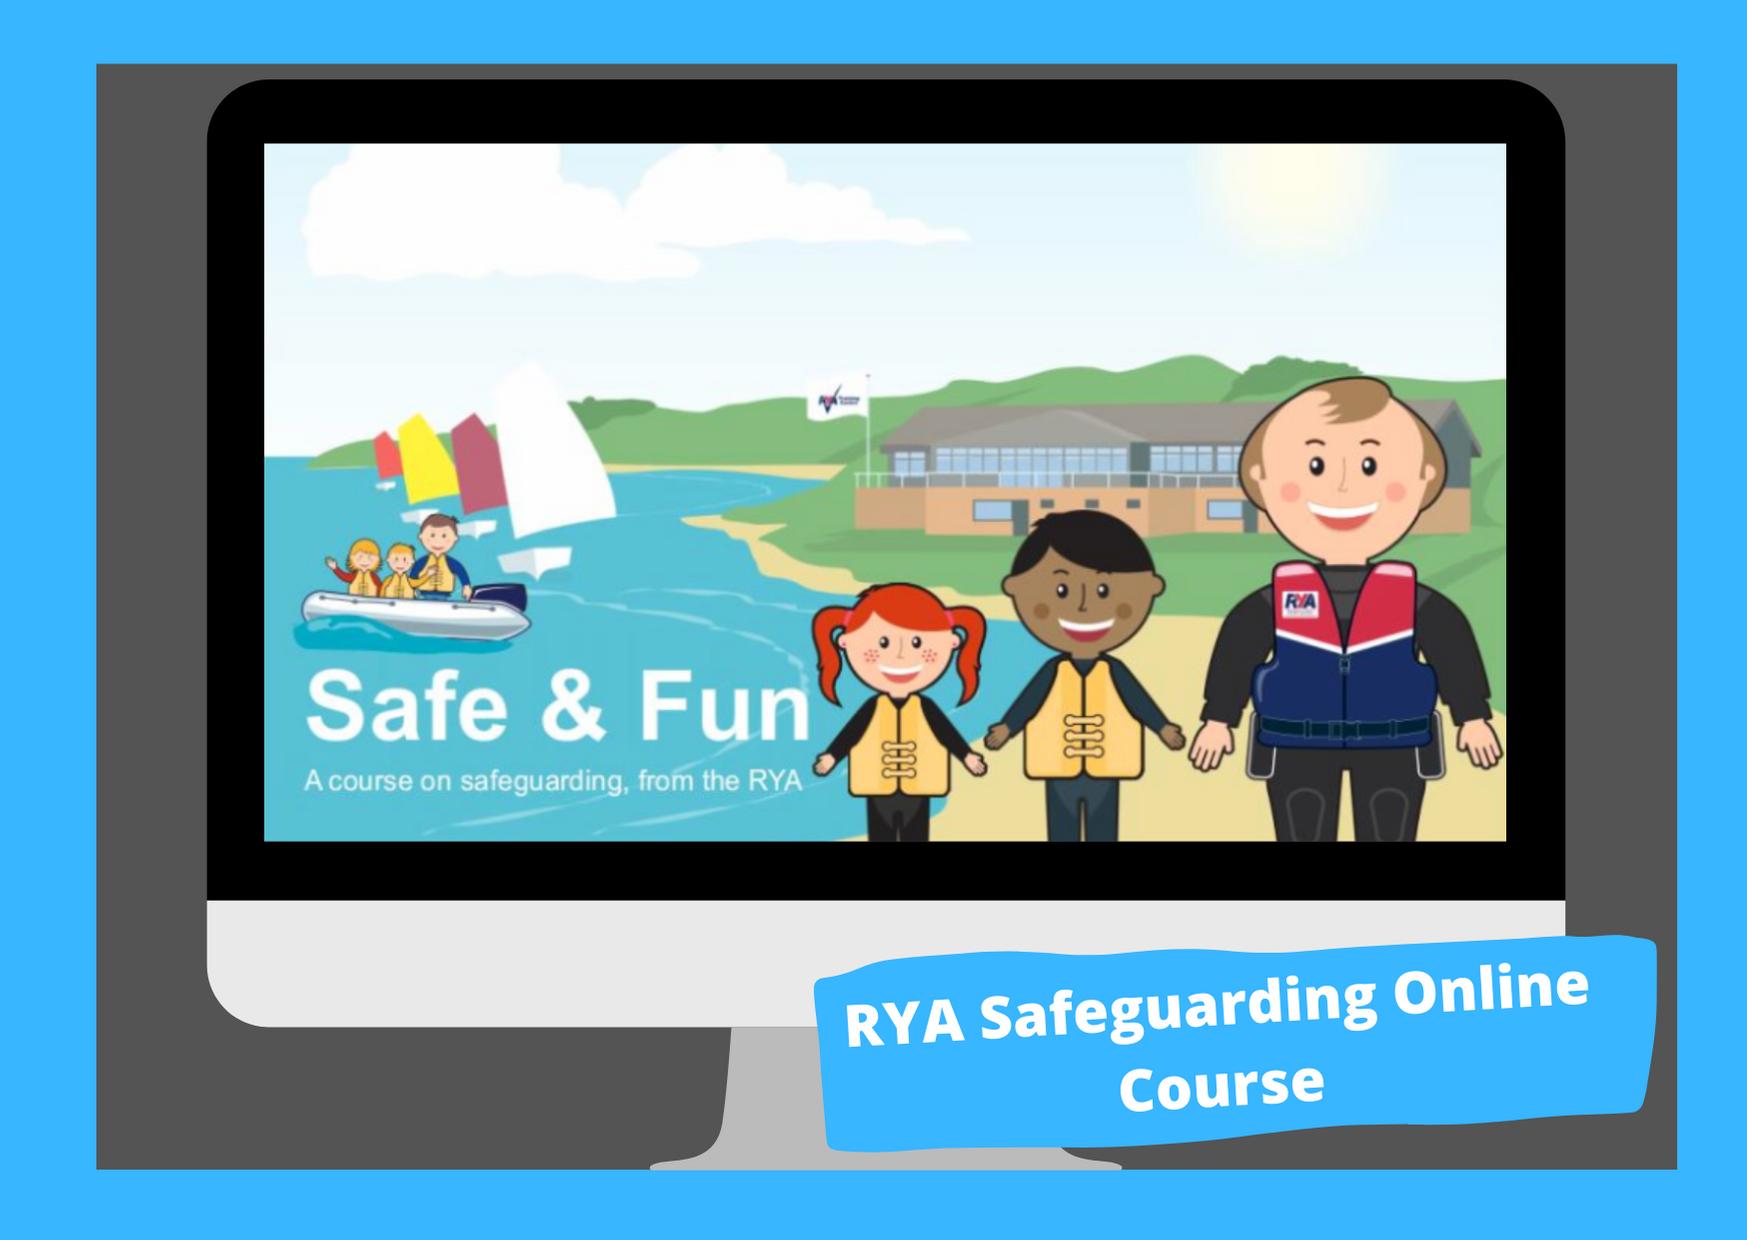 rya safe and fun course rya safeguarding